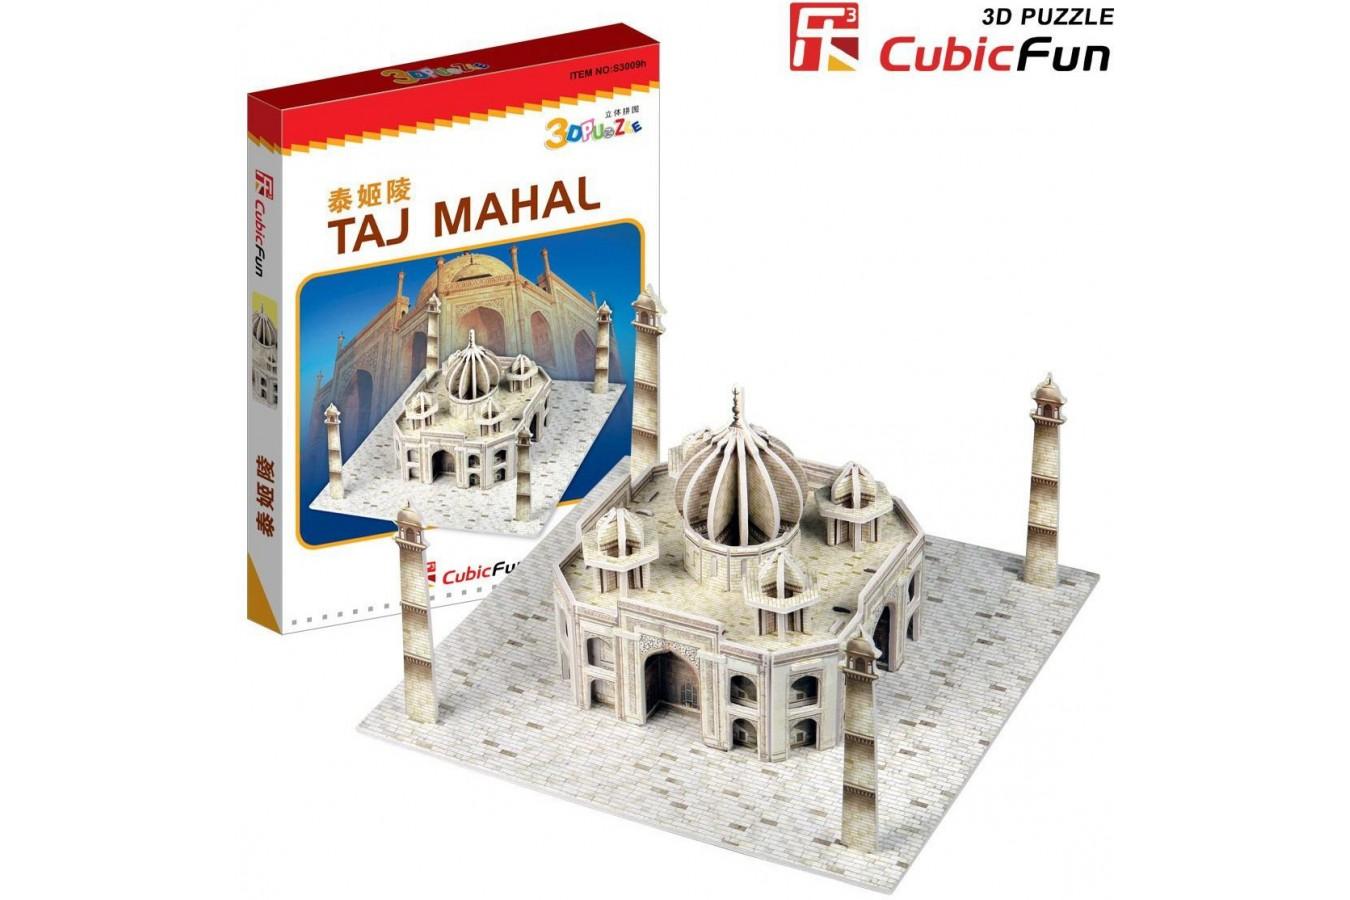 Puzzle 3D Cubic Fun - India : Taj Mahal, 39 piese (Cubic-Fun-S3009H) imagine